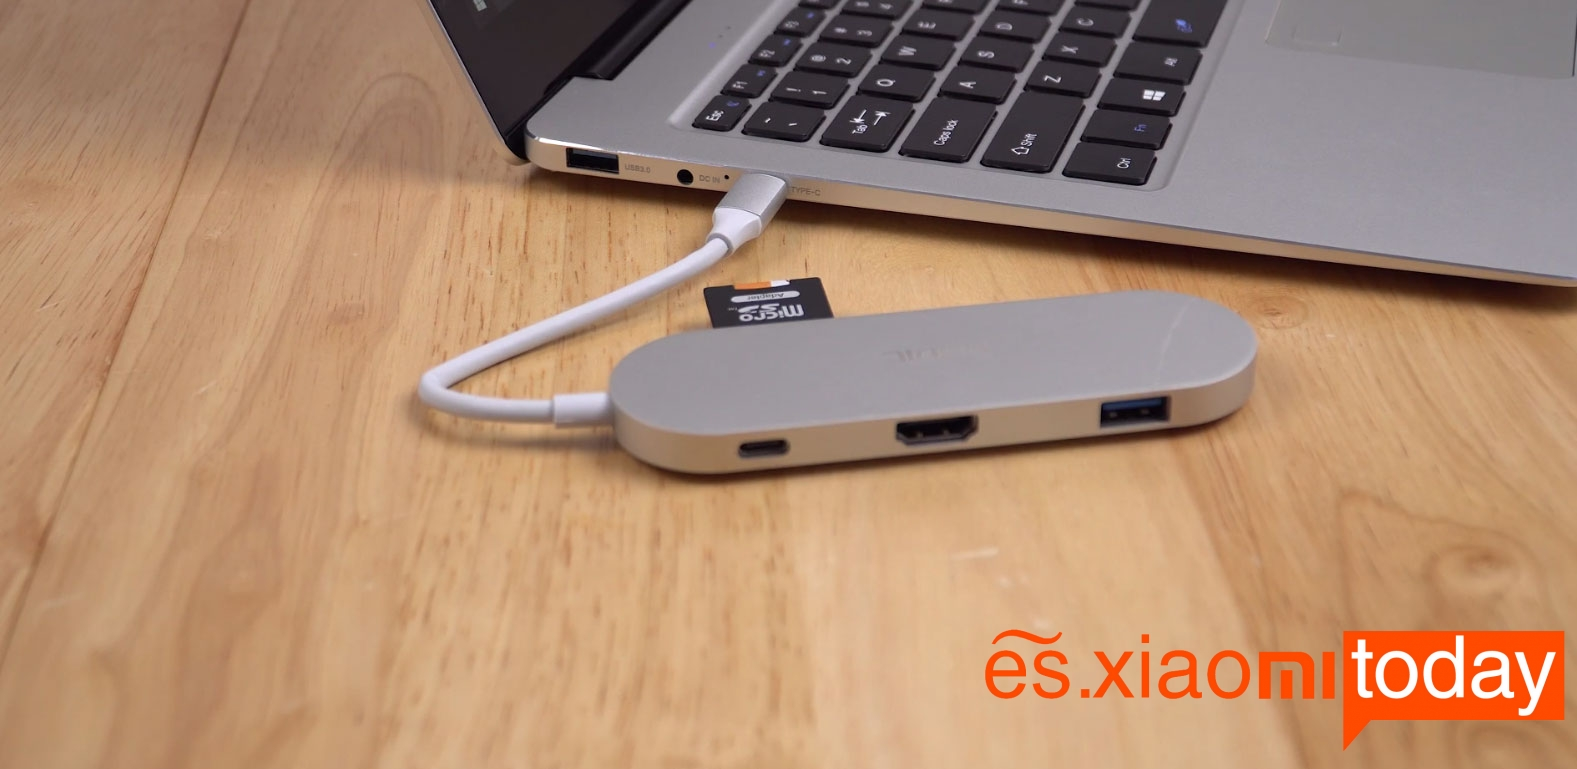 CUBE Thinker i35 Notebook extension de puertos